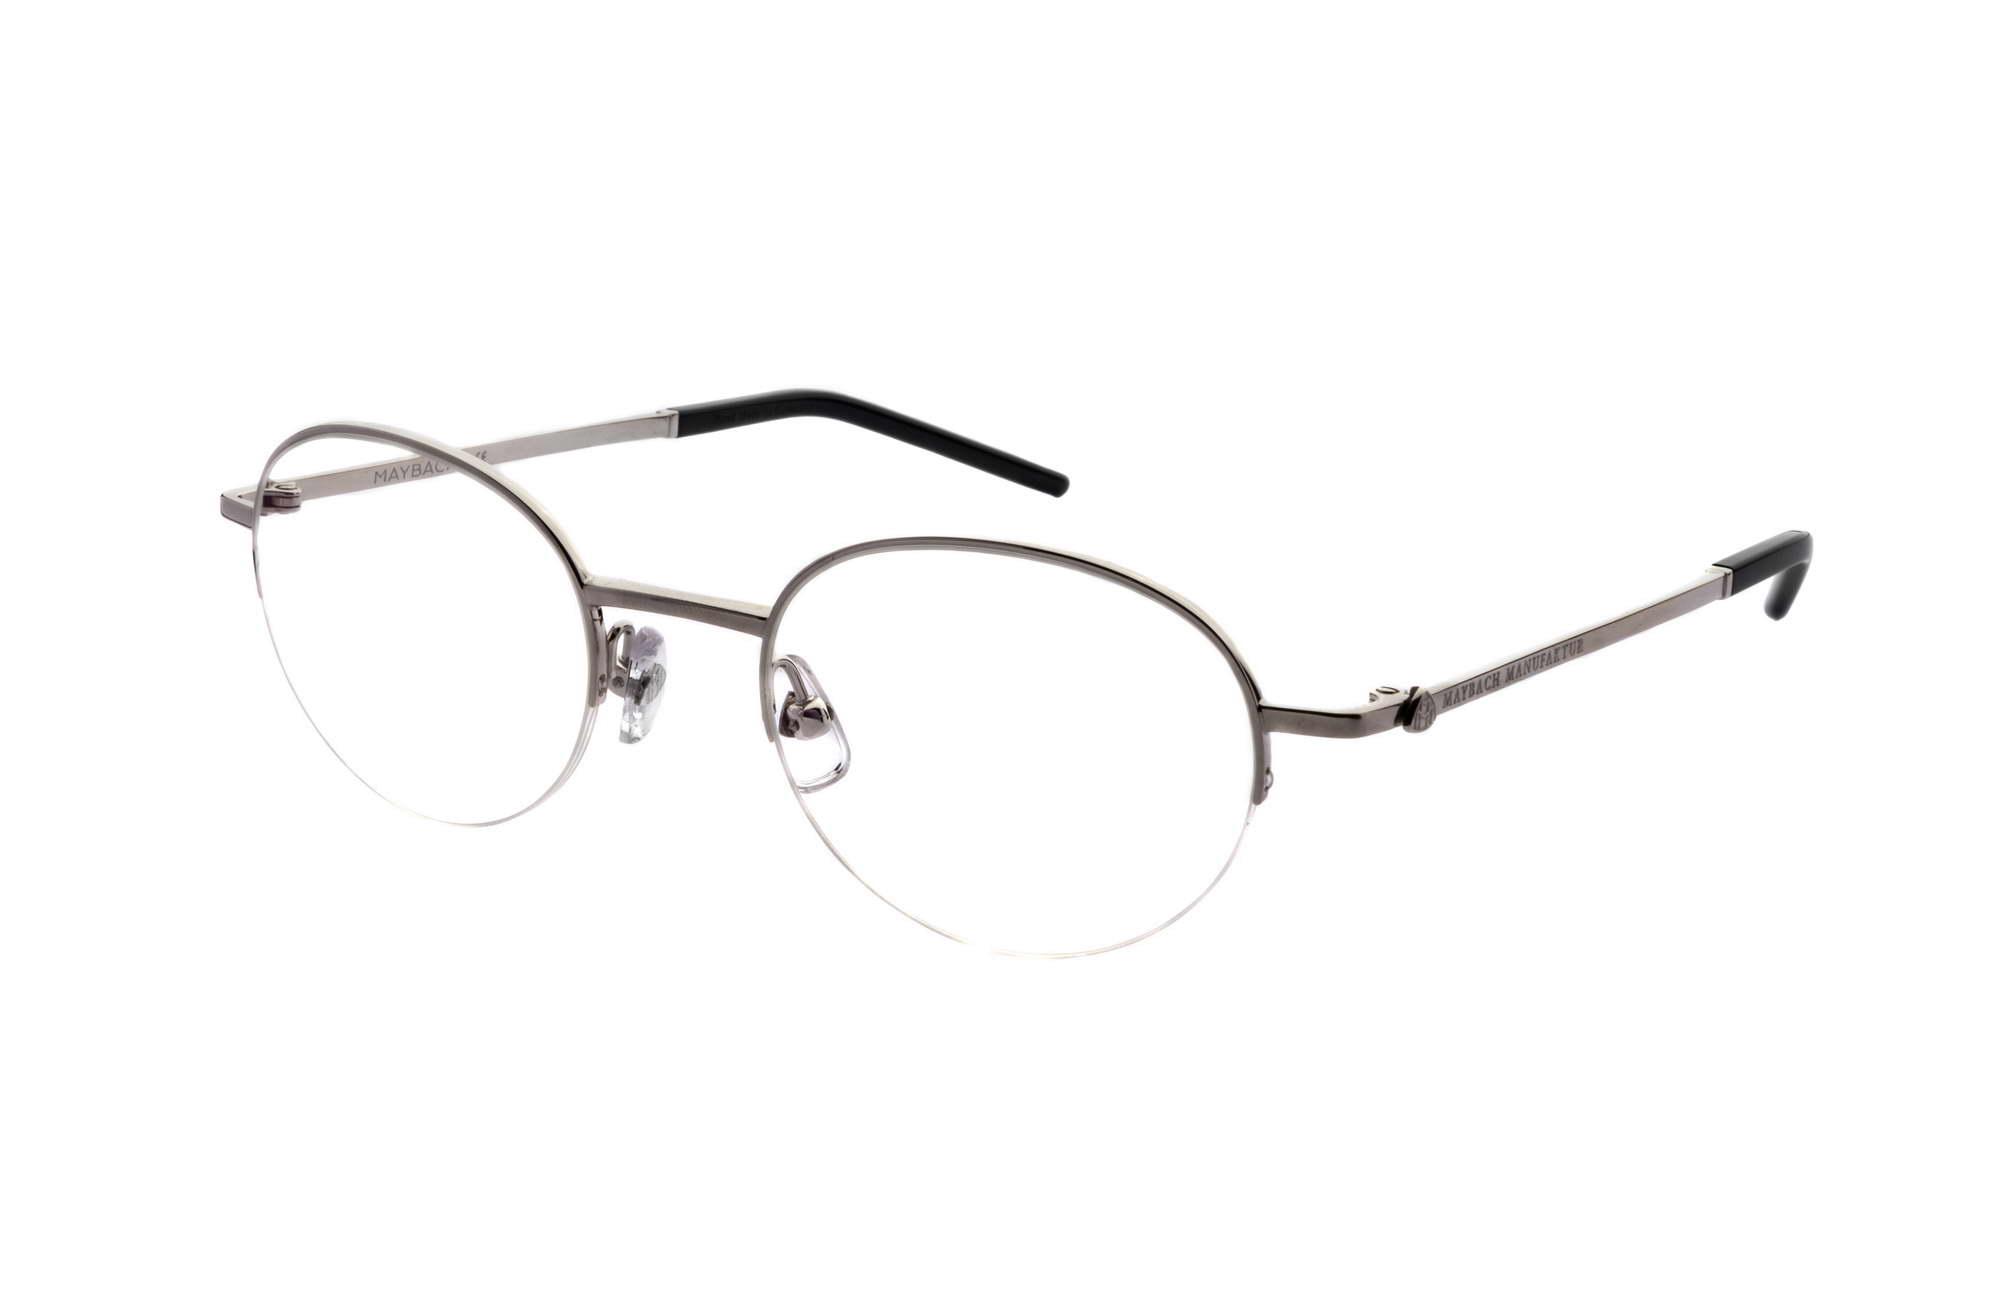 Maybach M1803 мужские оптические оправы для очков в салоне бинооптика